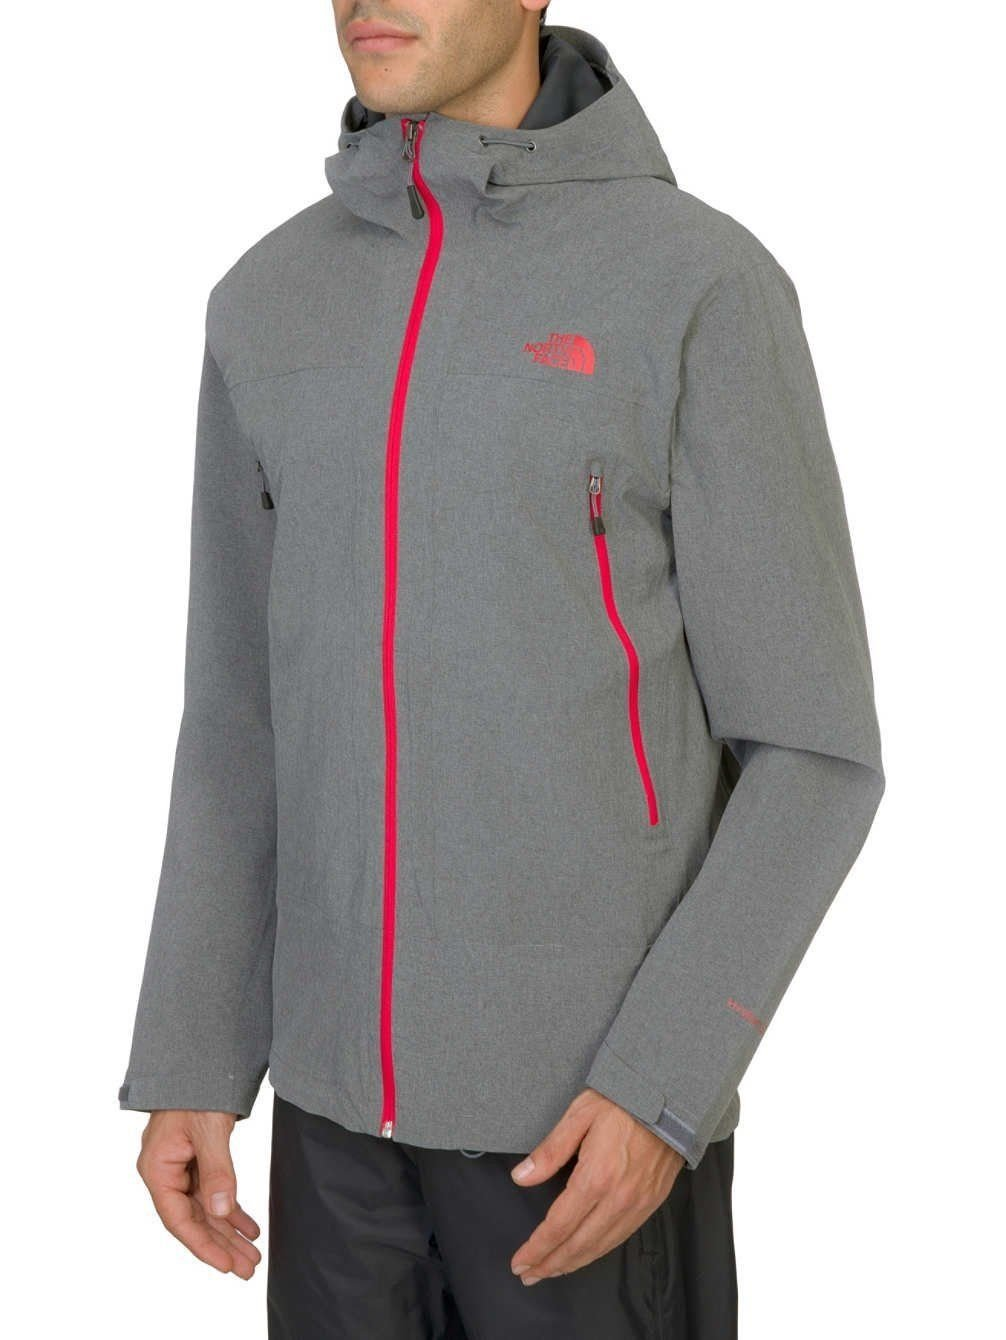 The North Face Mens Burst Rock Jacket softshell coat M-XL NEW